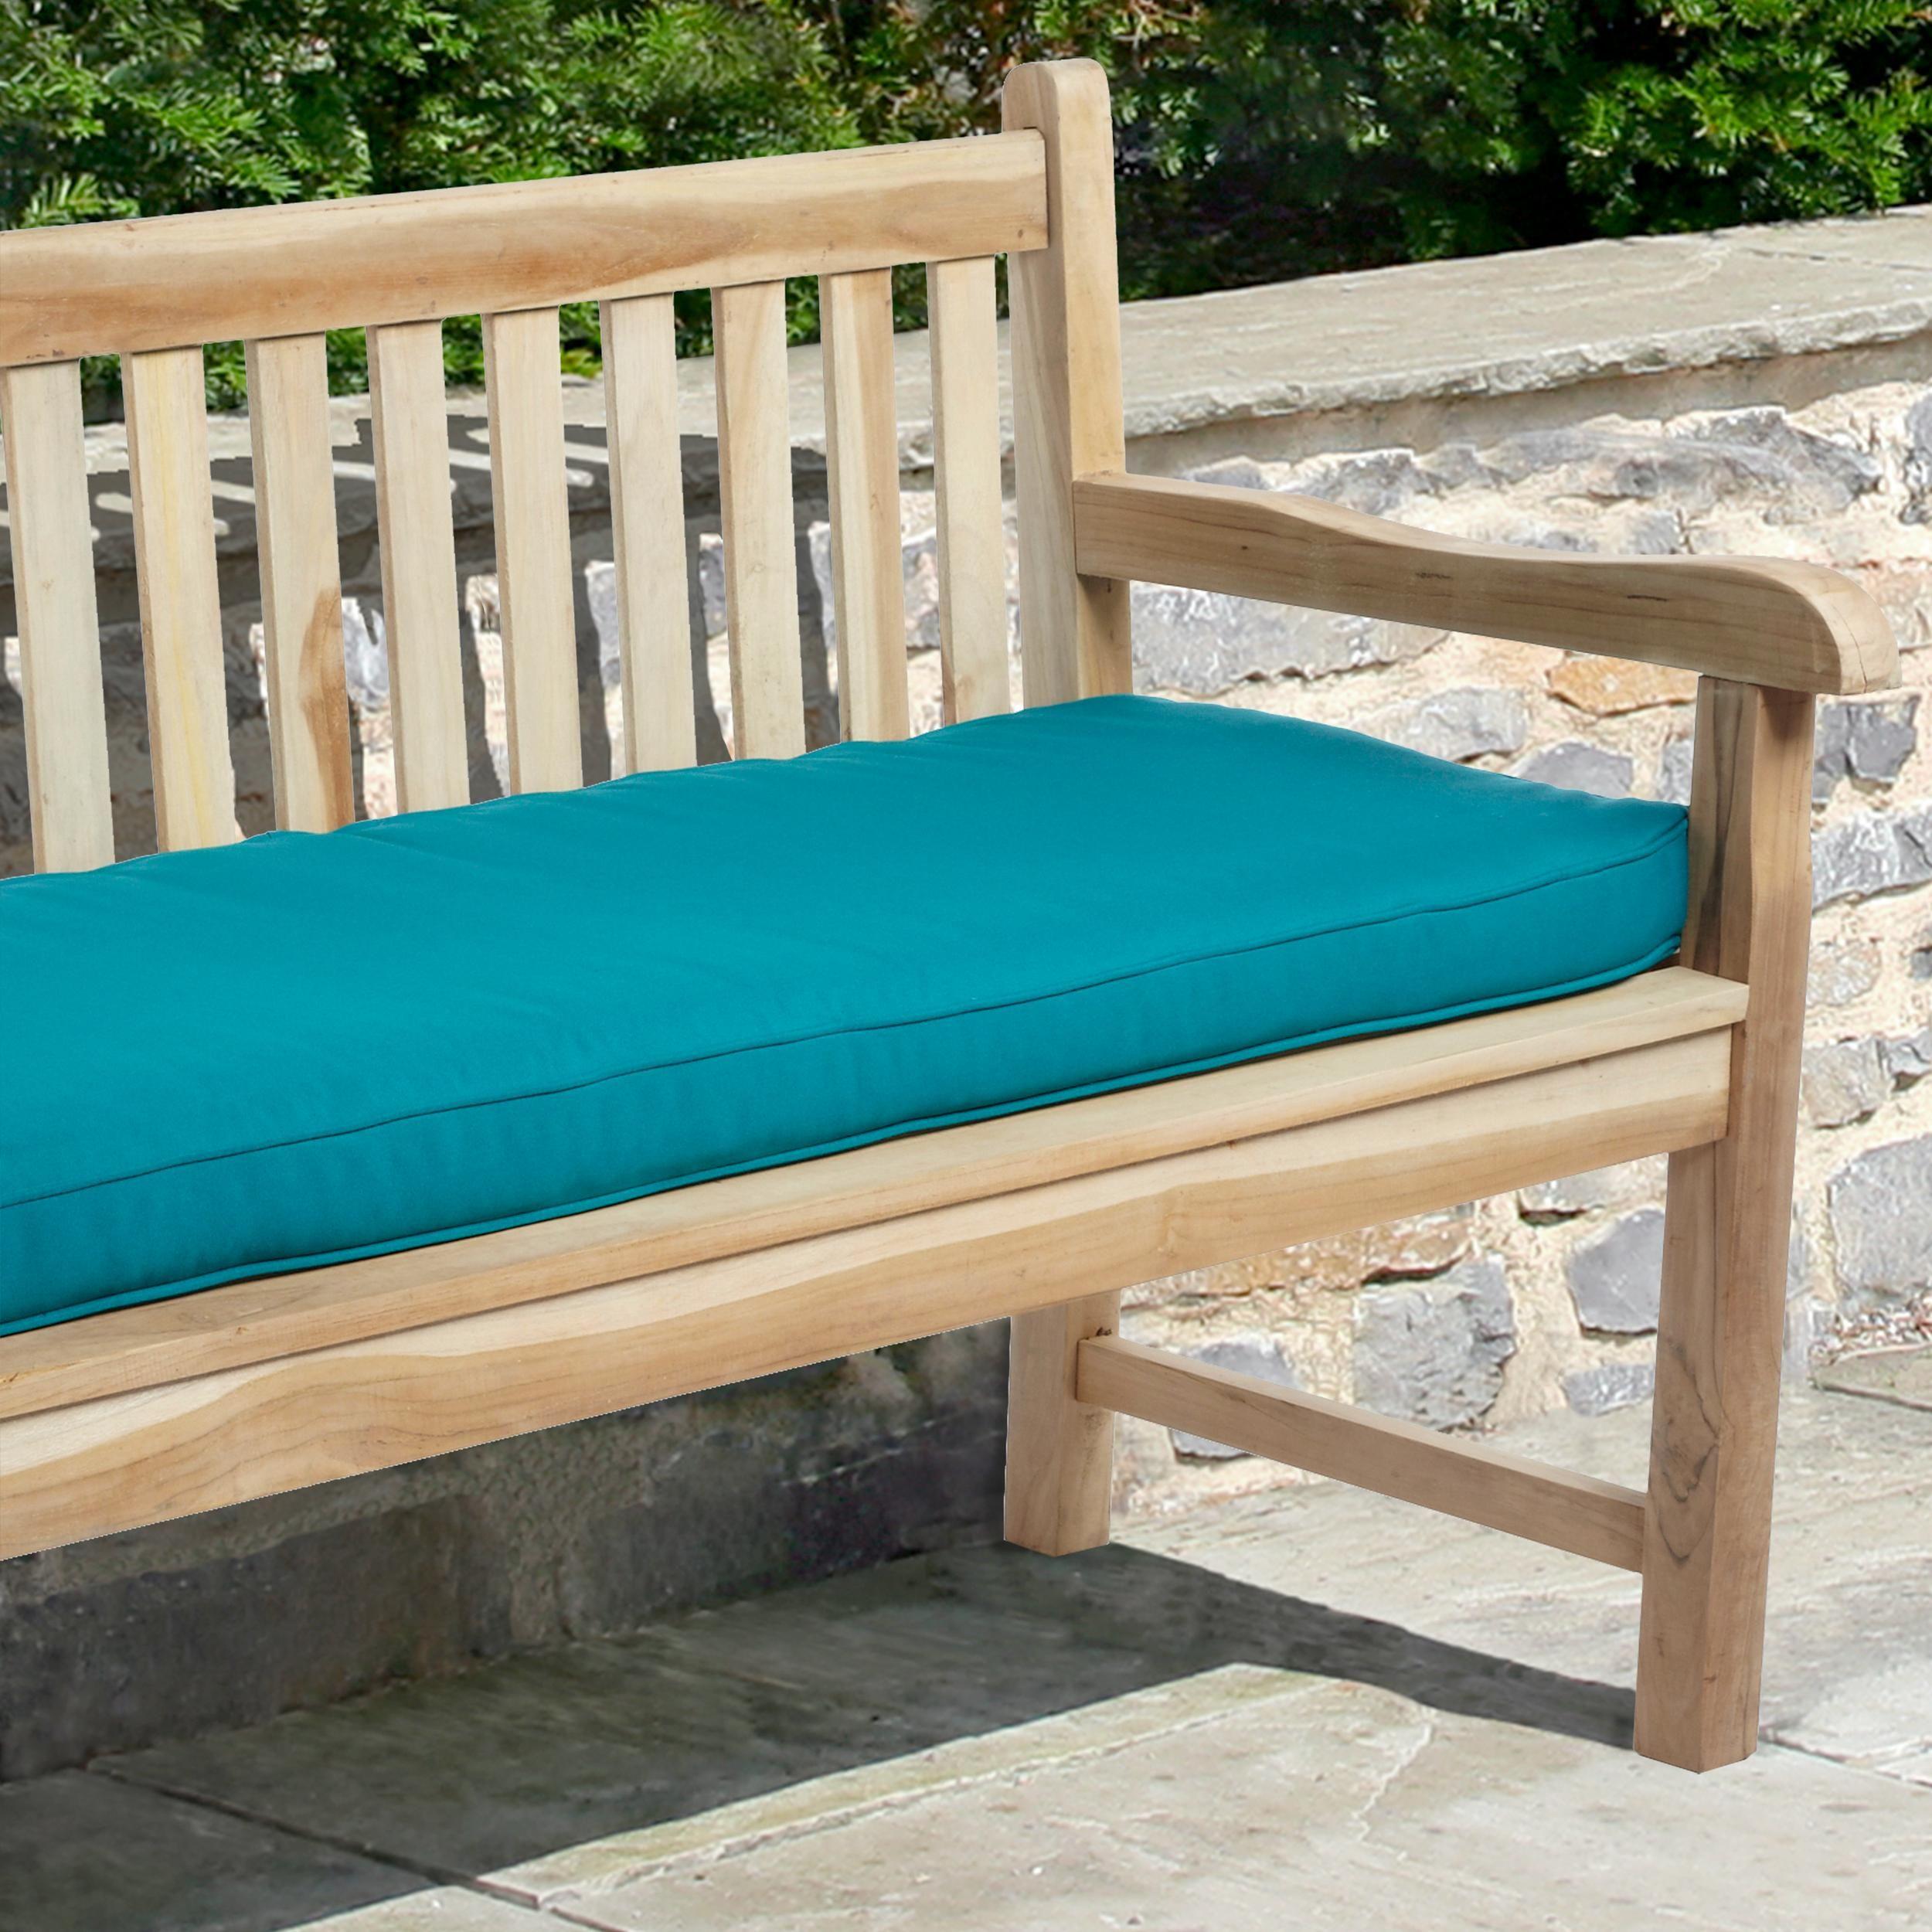 Amazon Mozaic Indoor Outdoor Corded Bench Cushion 48 Inch